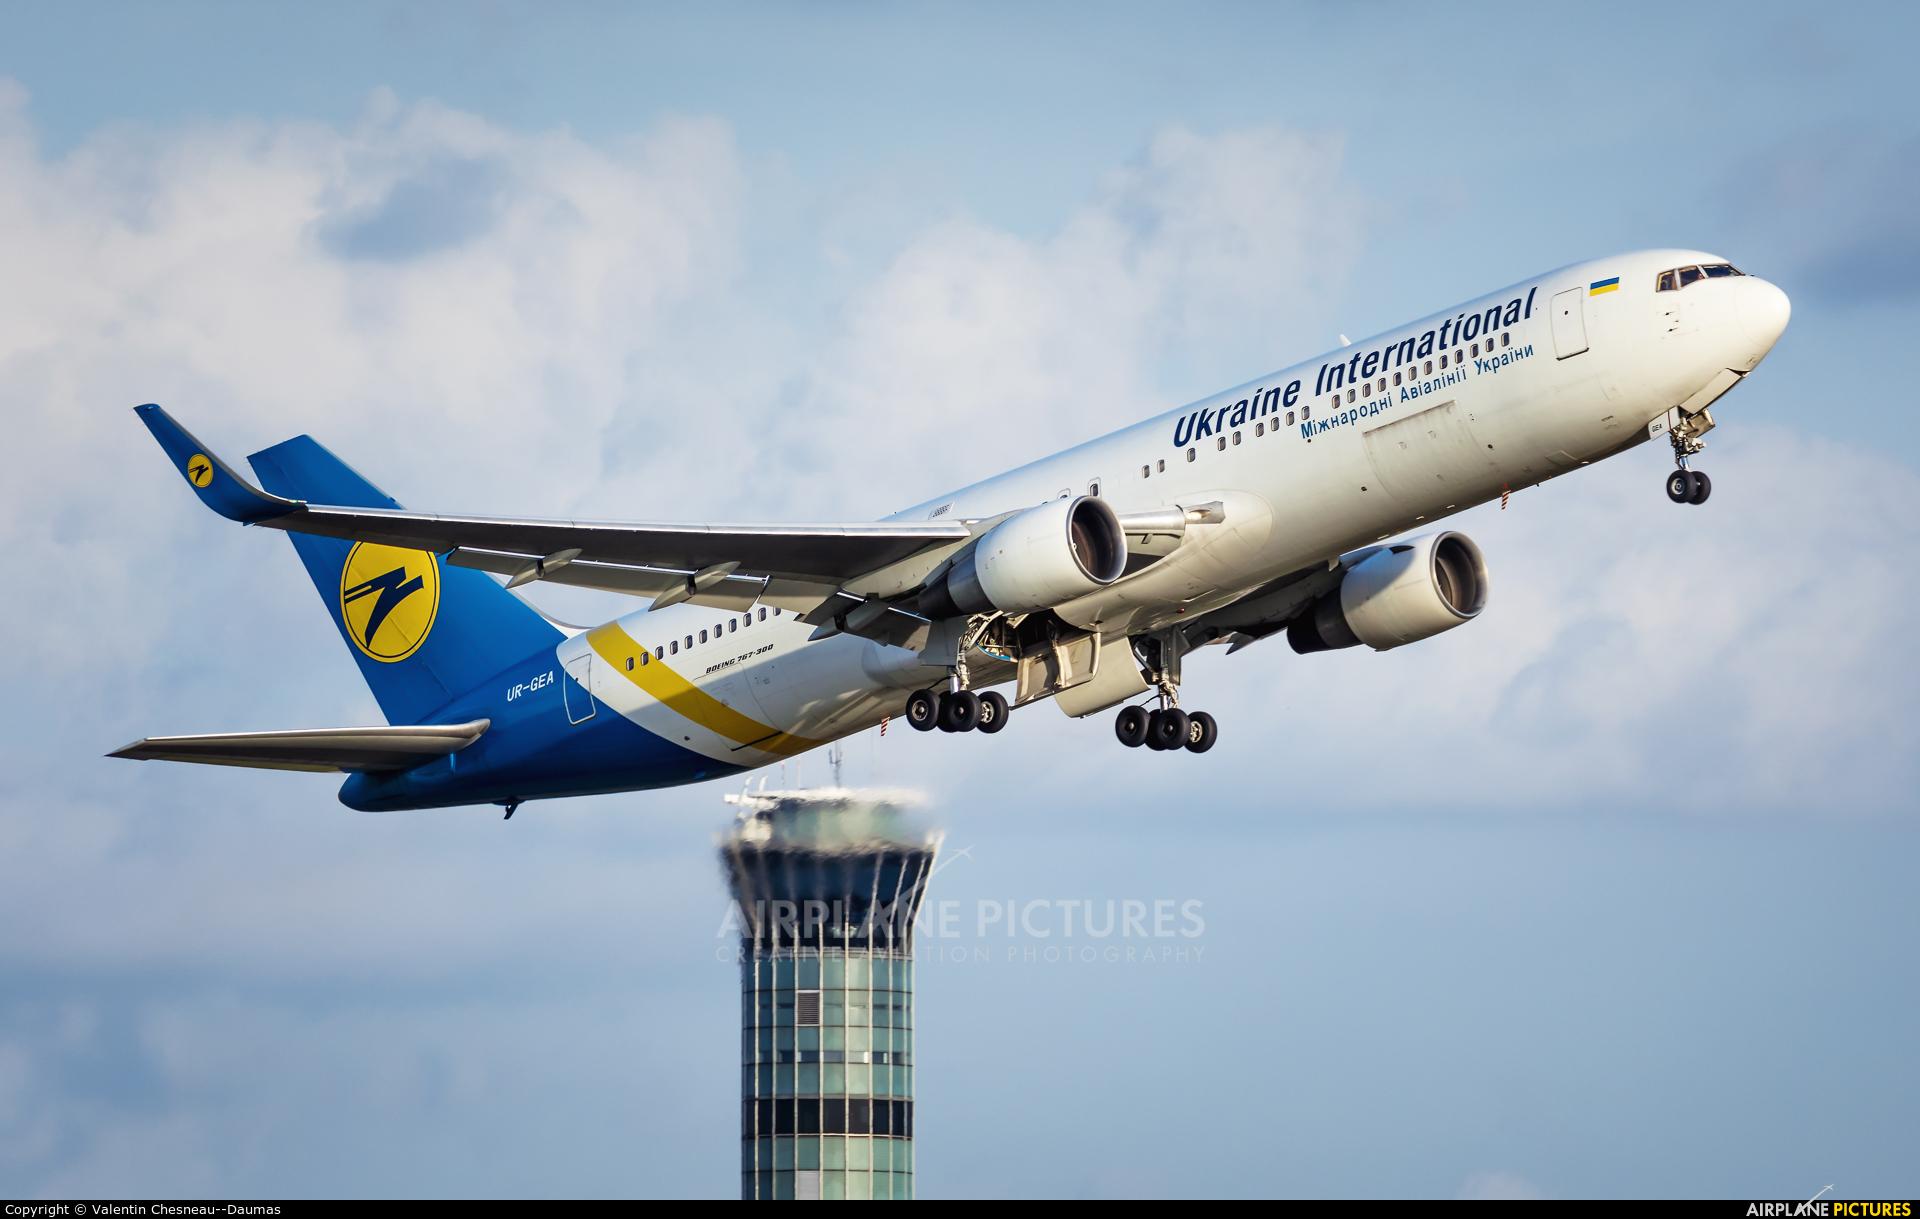 Ukraine International Airlines UR-GEA aircraft at Paris - Charles de Gaulle